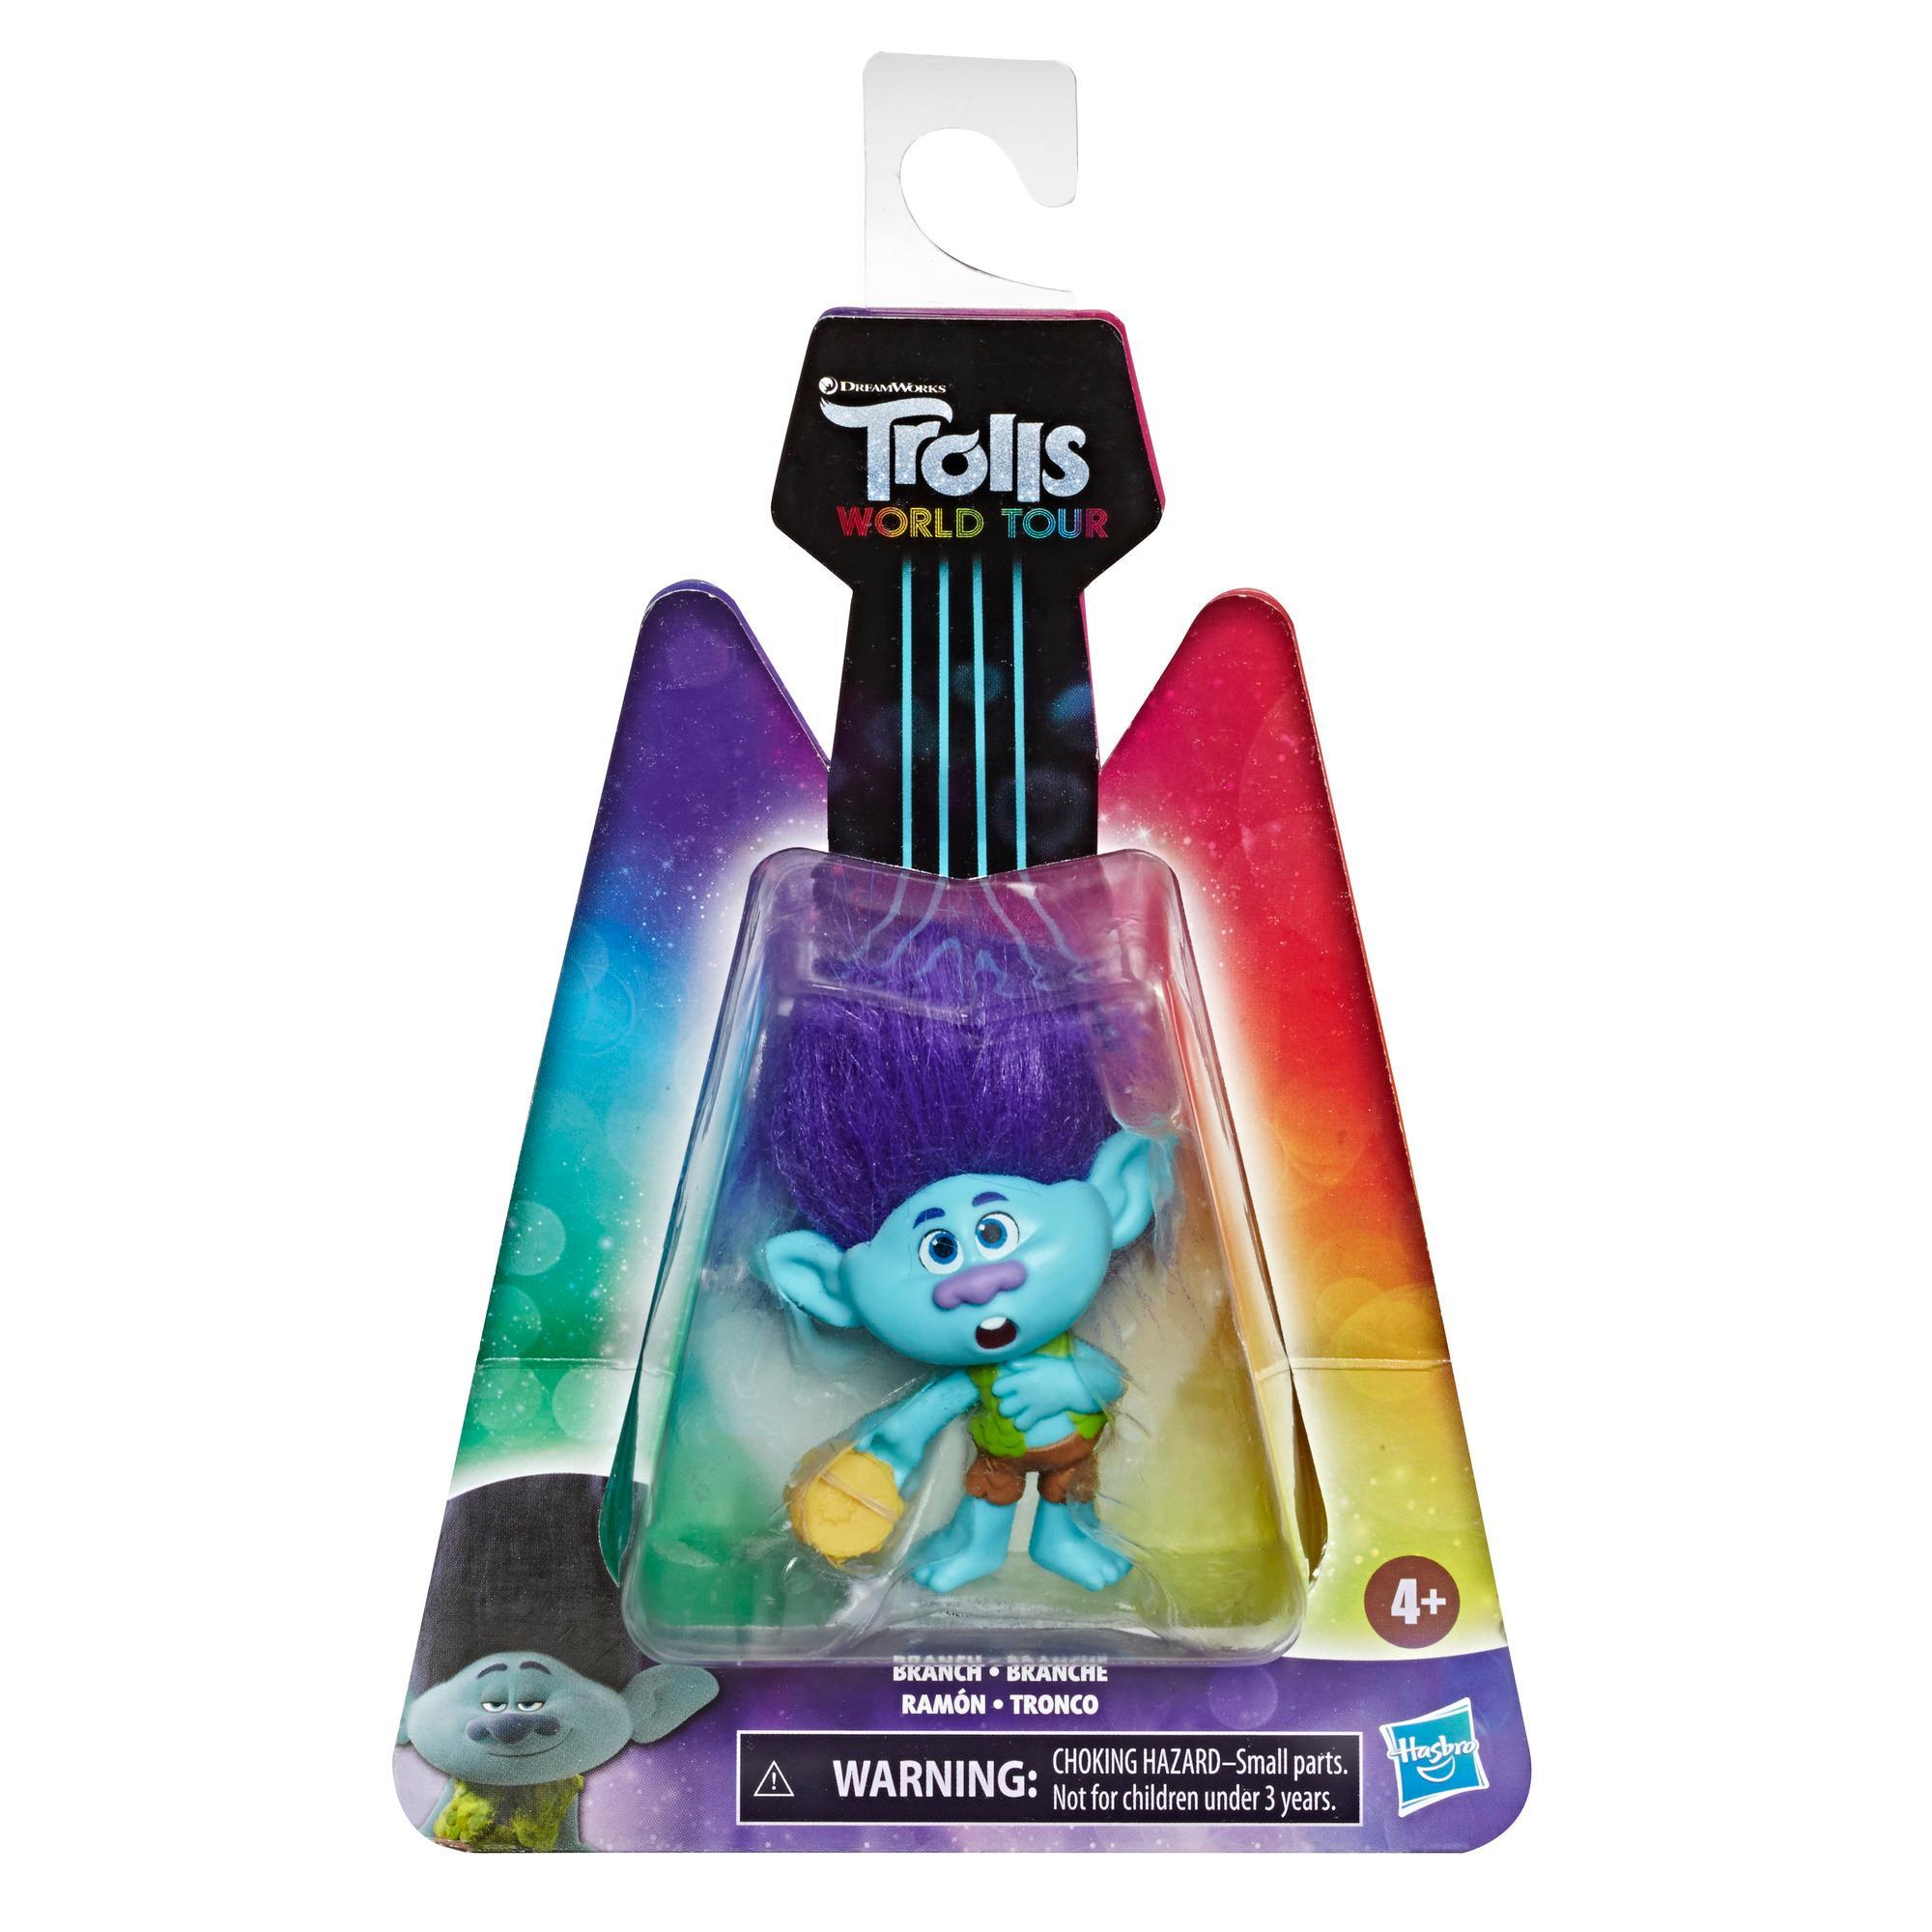 DreamWorks Trolls World Tour - Ramón - Figura de Ramón con pandereta - Juguete inspirado en la película Trolls 2